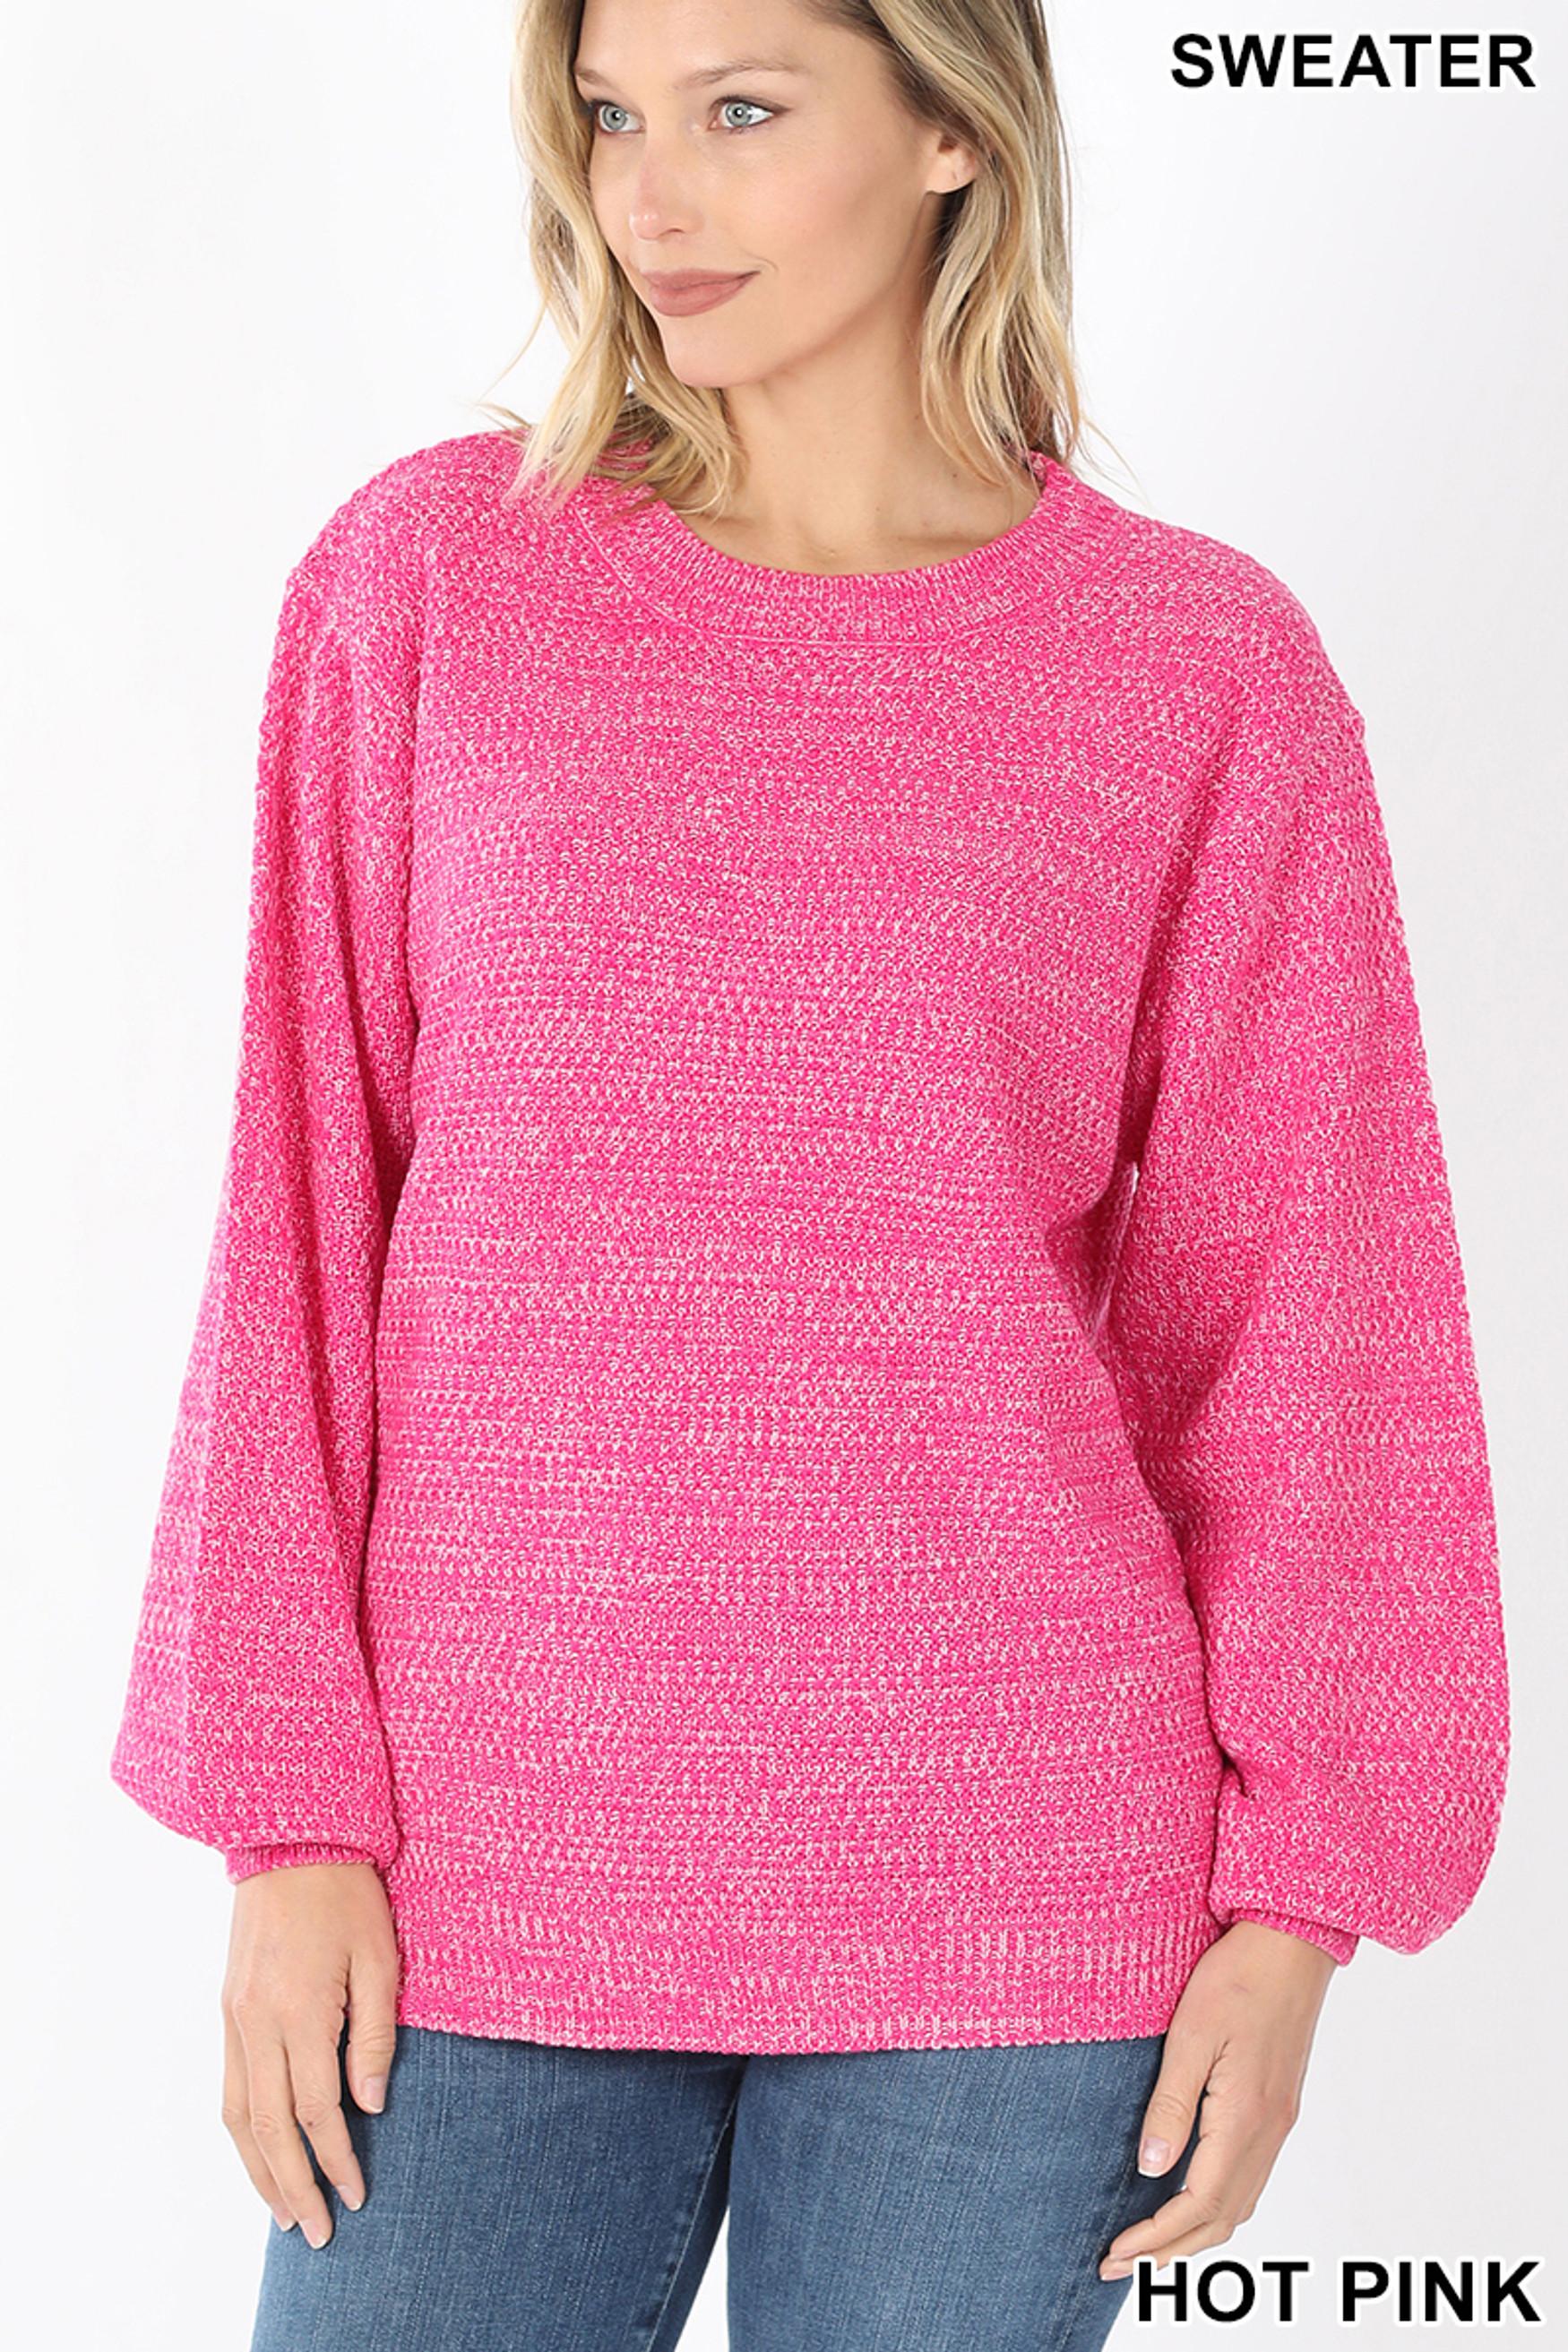 Front image of Hot Pink Balloon Sleeve Melange Sweater